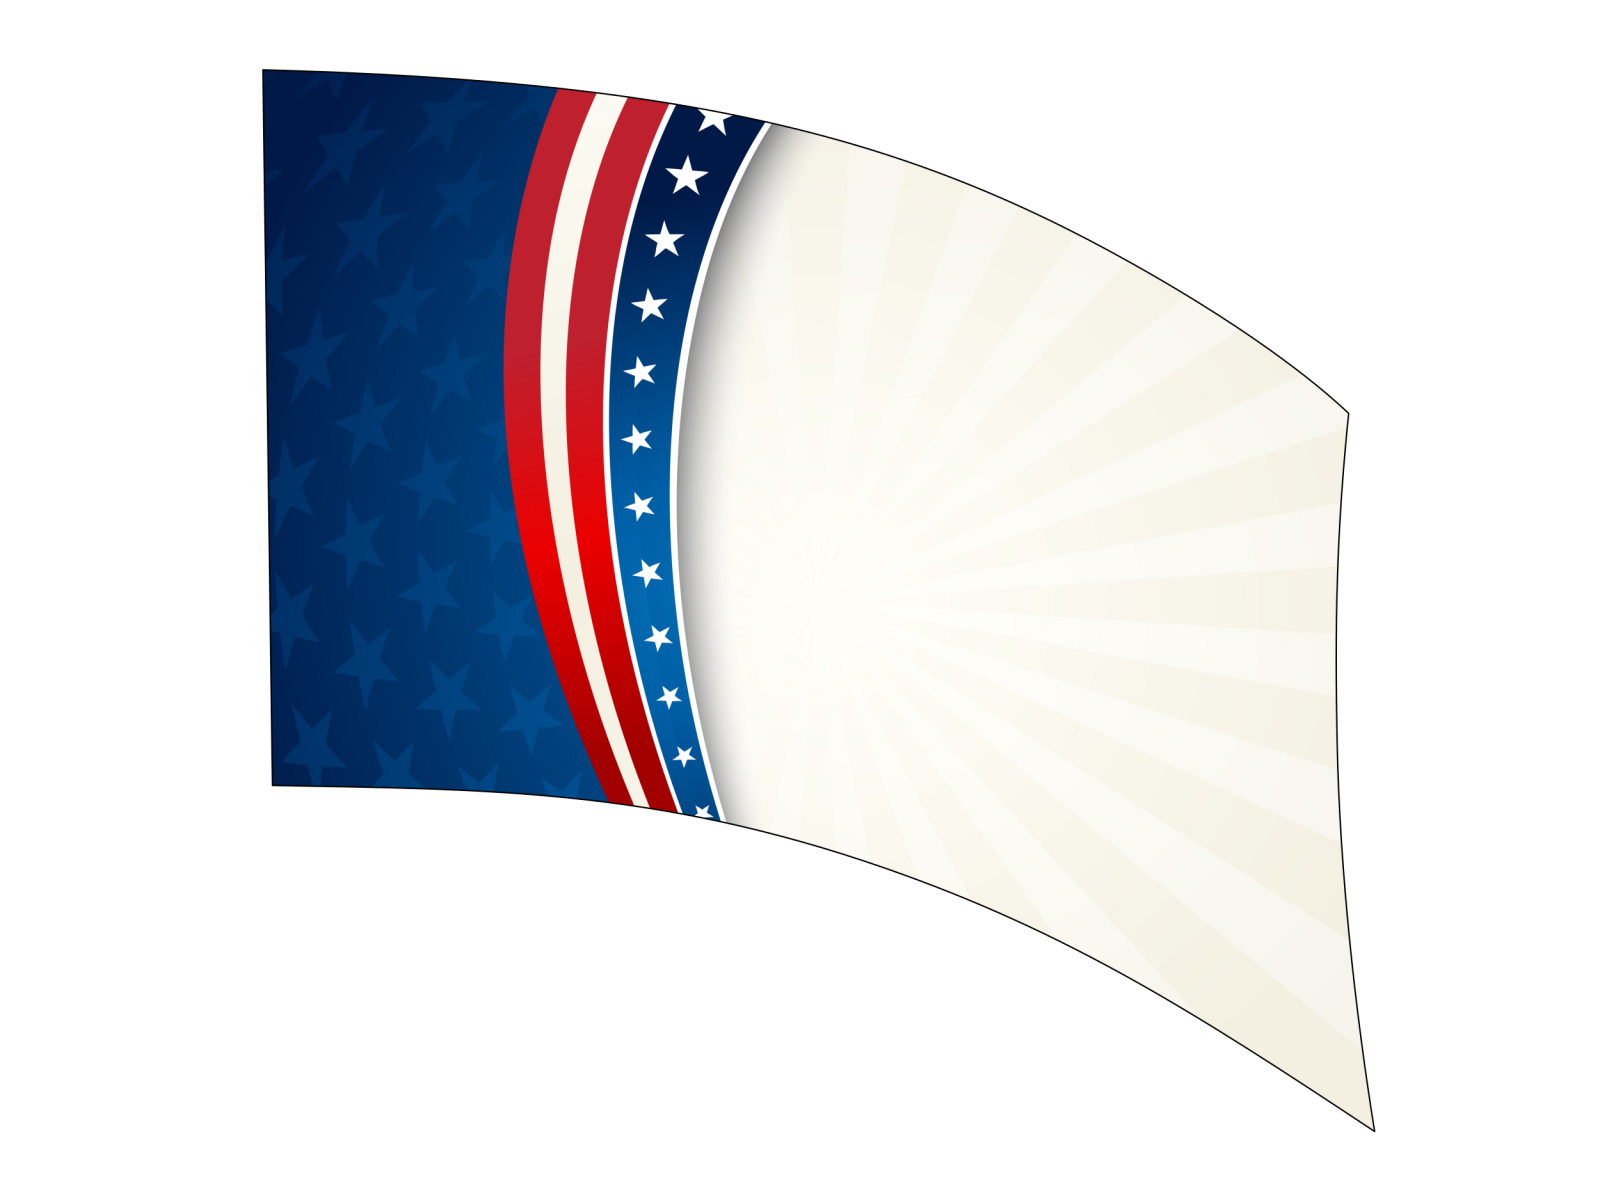 060217s - 36x52 Standard Patriotic 1